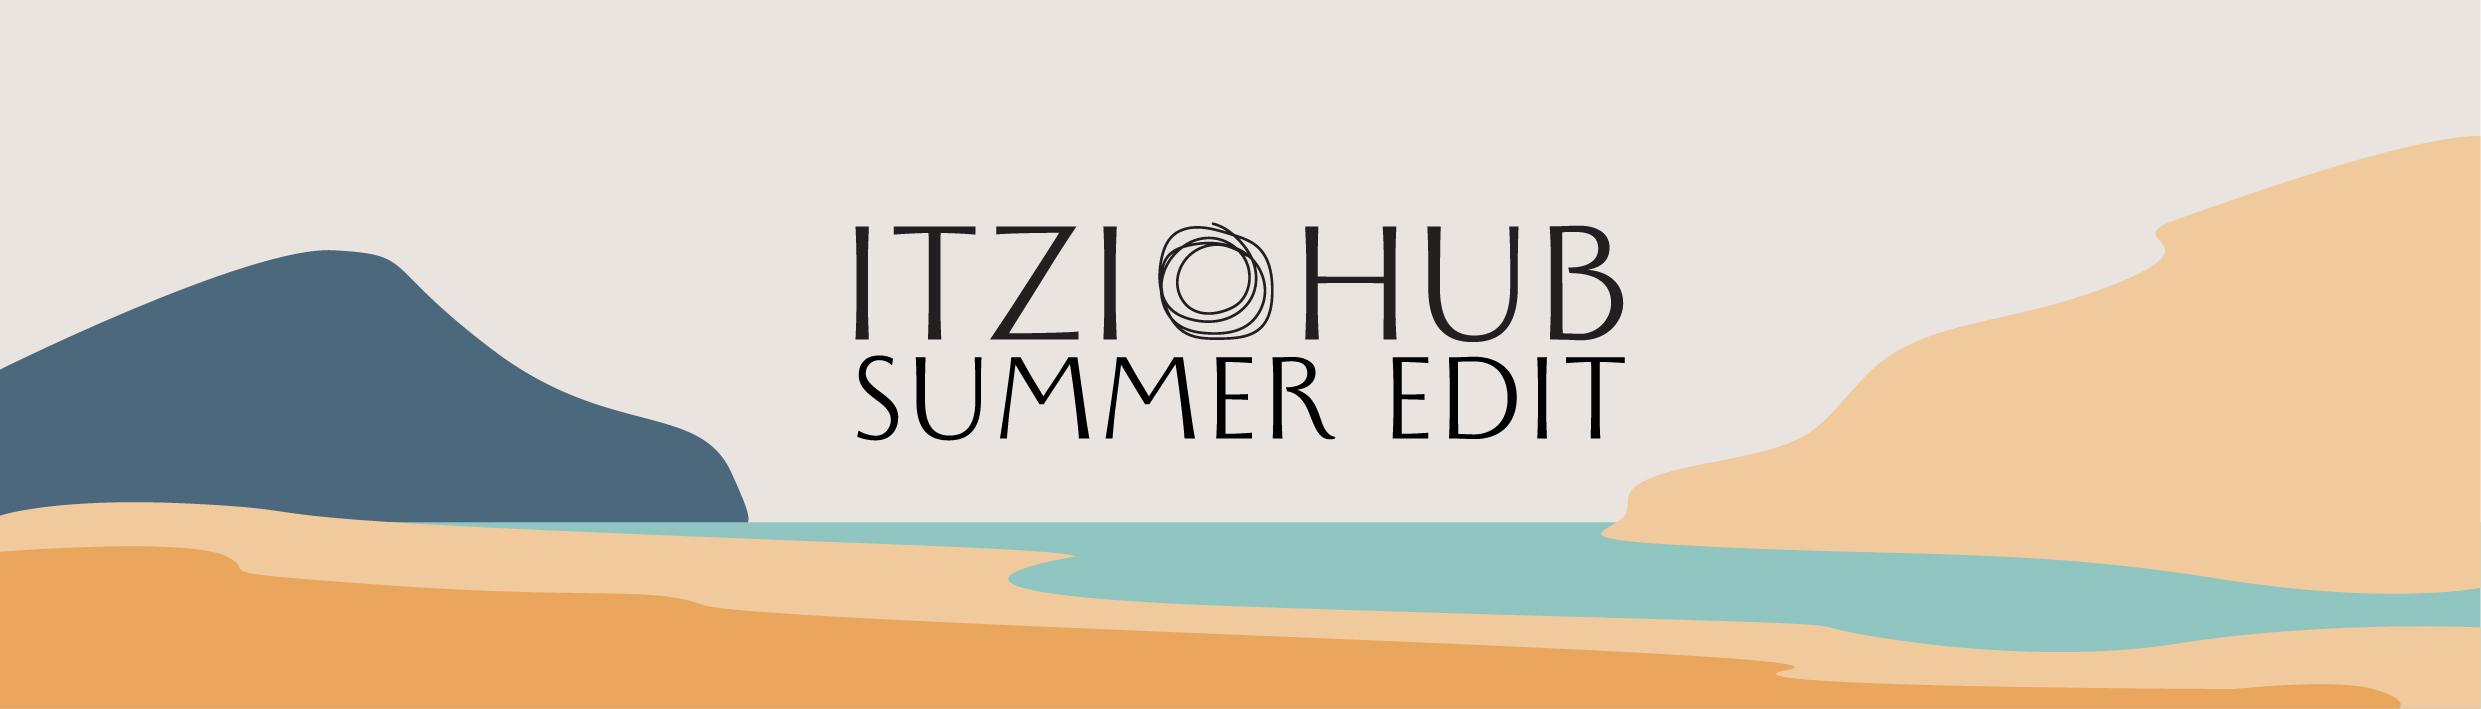 itzi hub summer edit news itzi hub il luogo sicuro per i tuoi regali